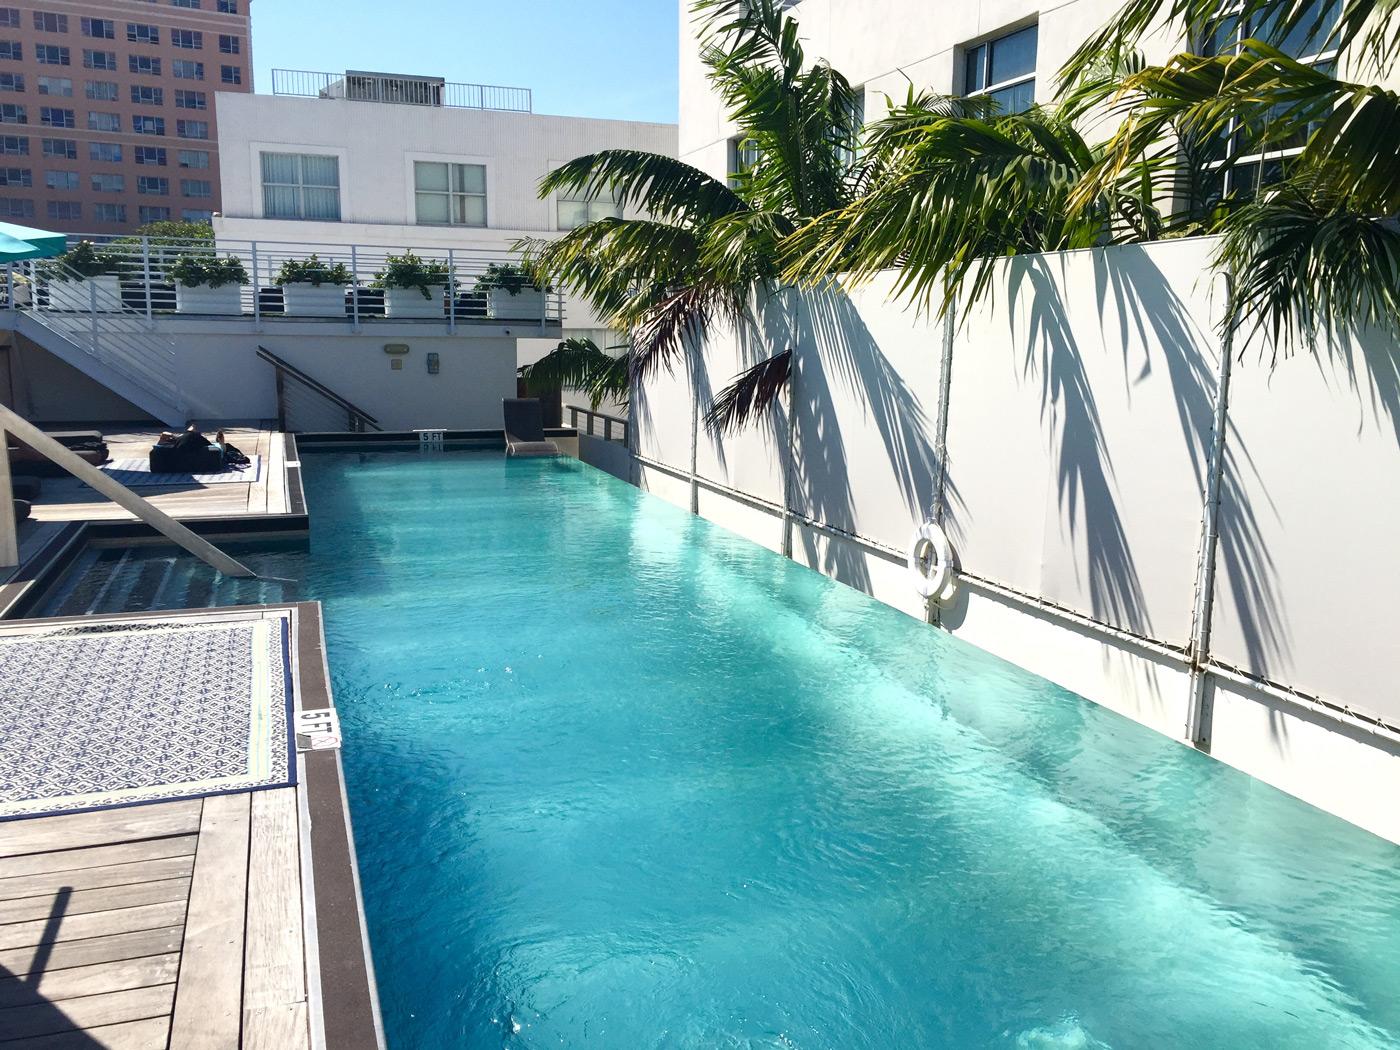 The hostel pool